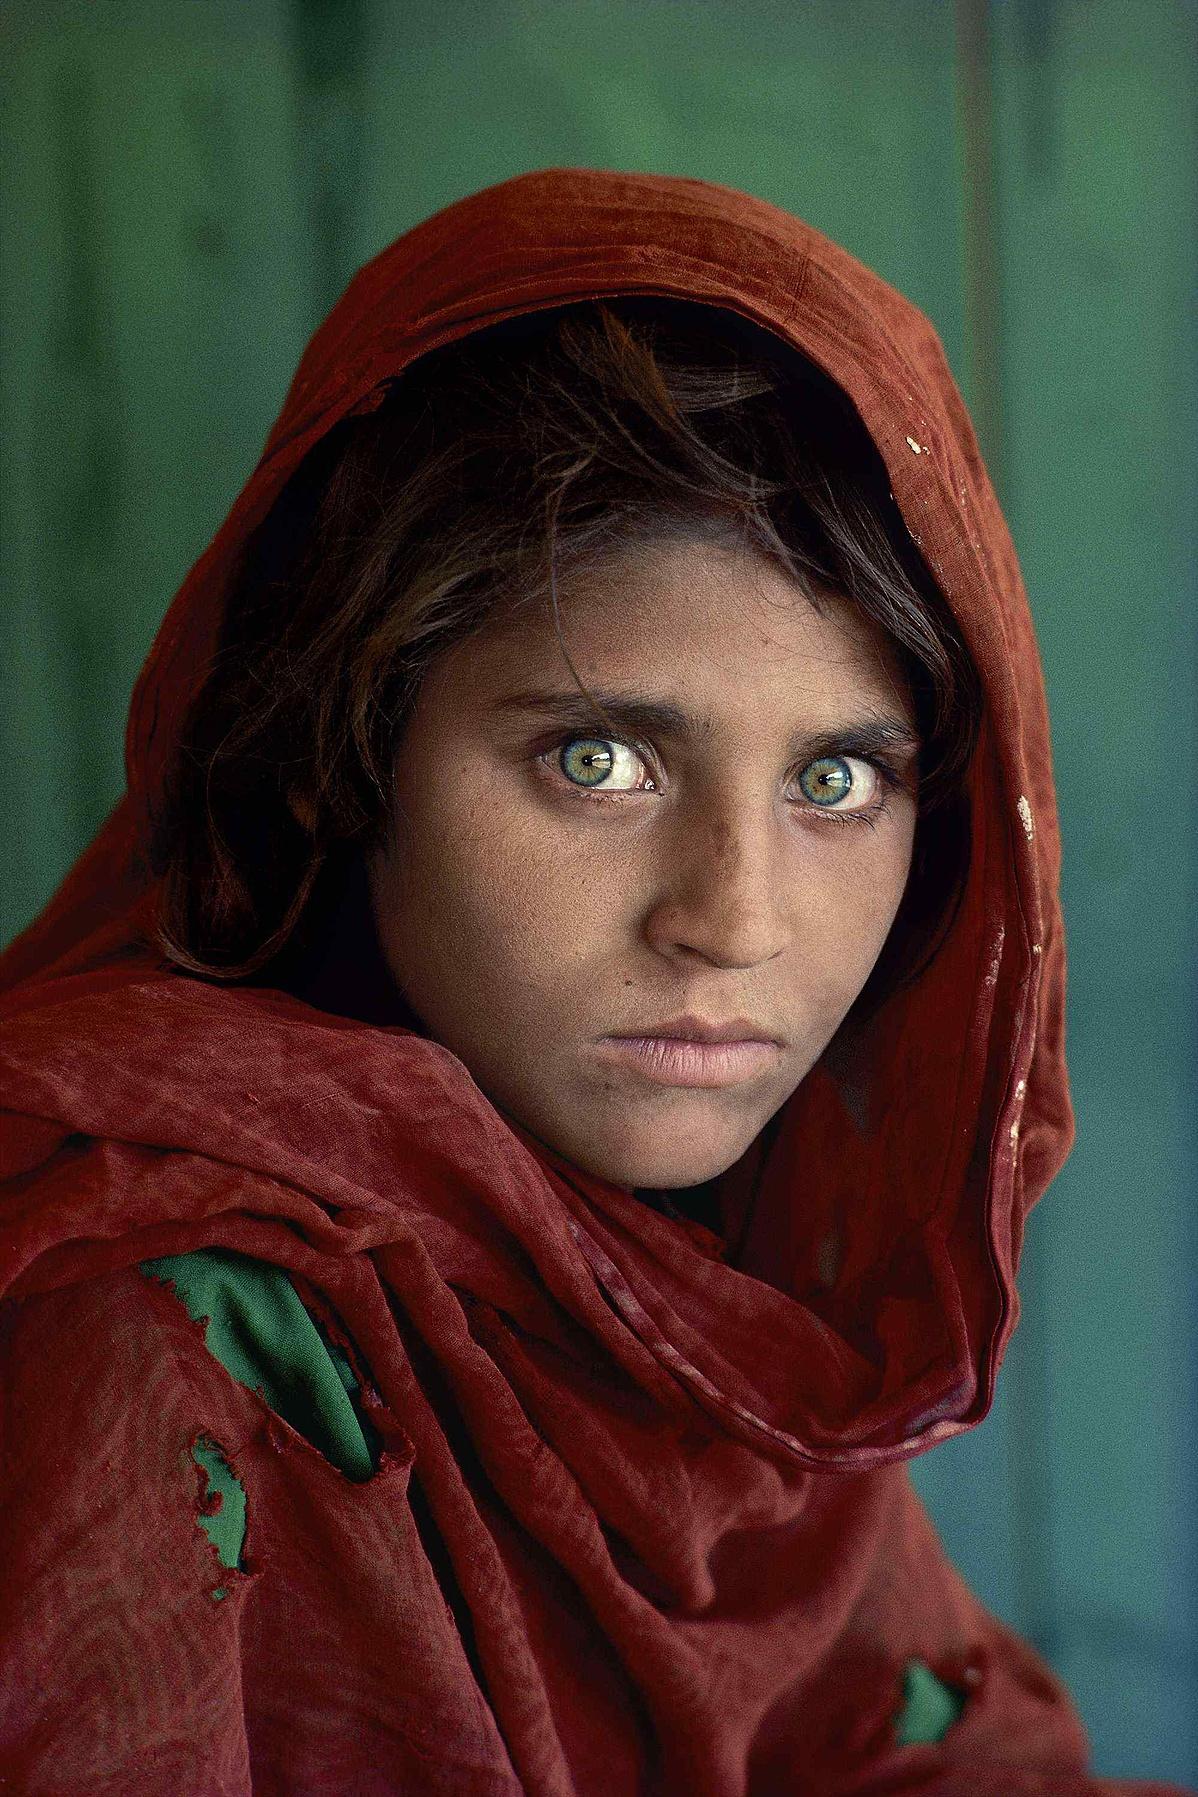 SteveMcCurry afganlany